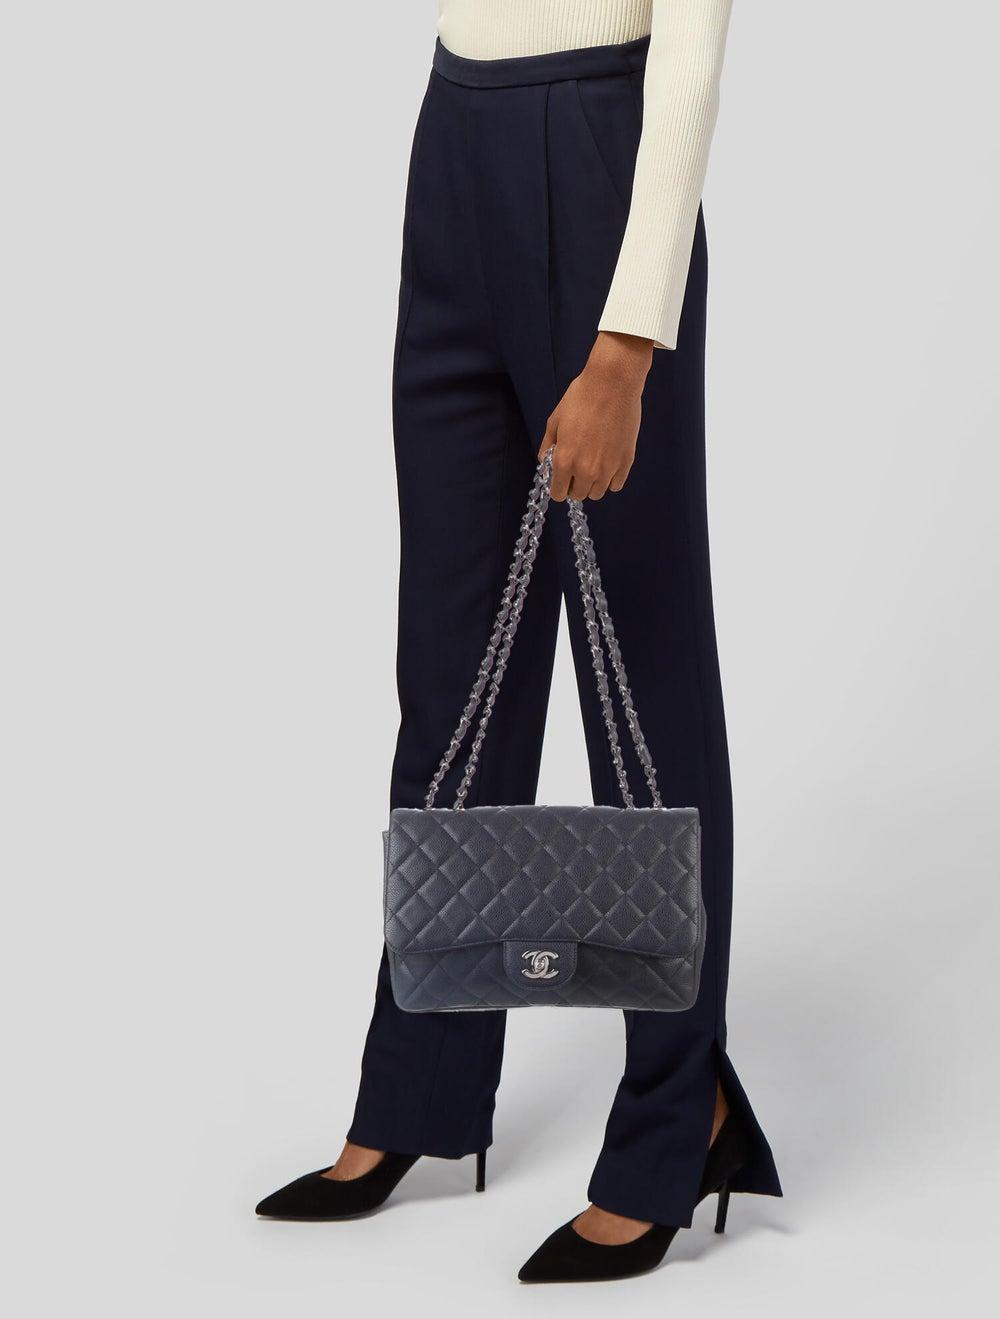 Chanel Jumbo Single Flap Bag Blue - image 2